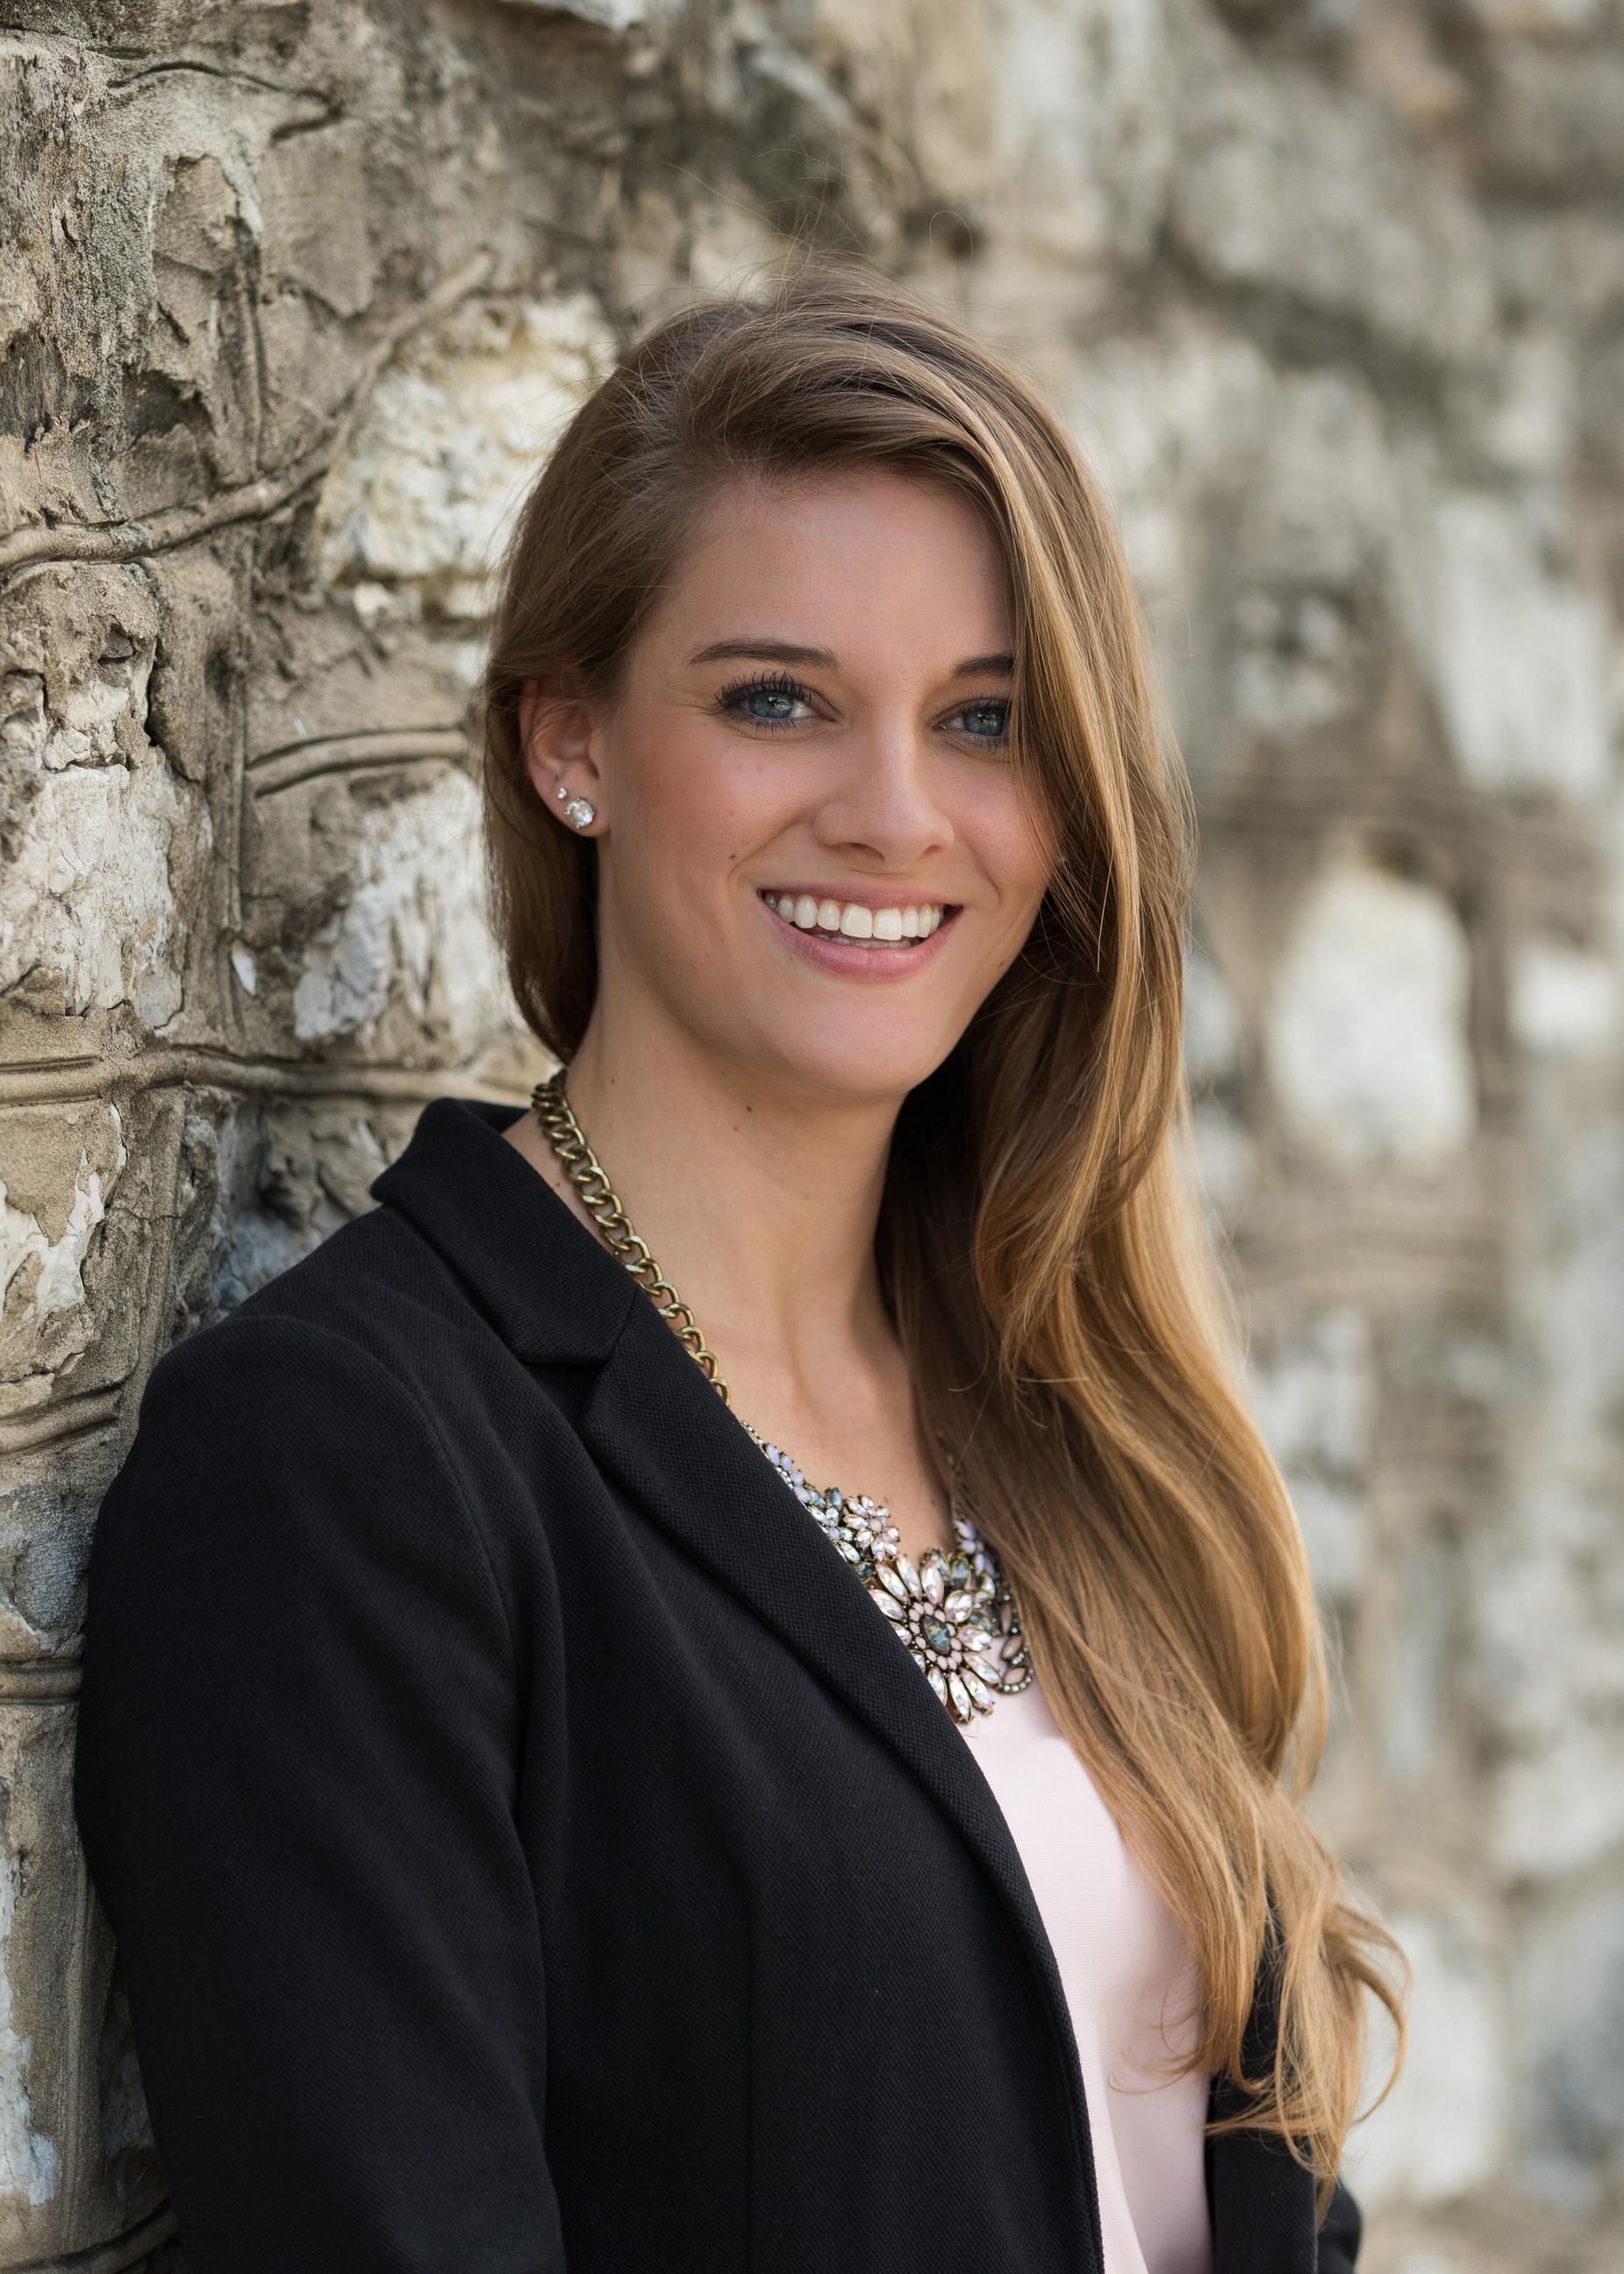 Chattanooga TN Female Business Executive Headshot